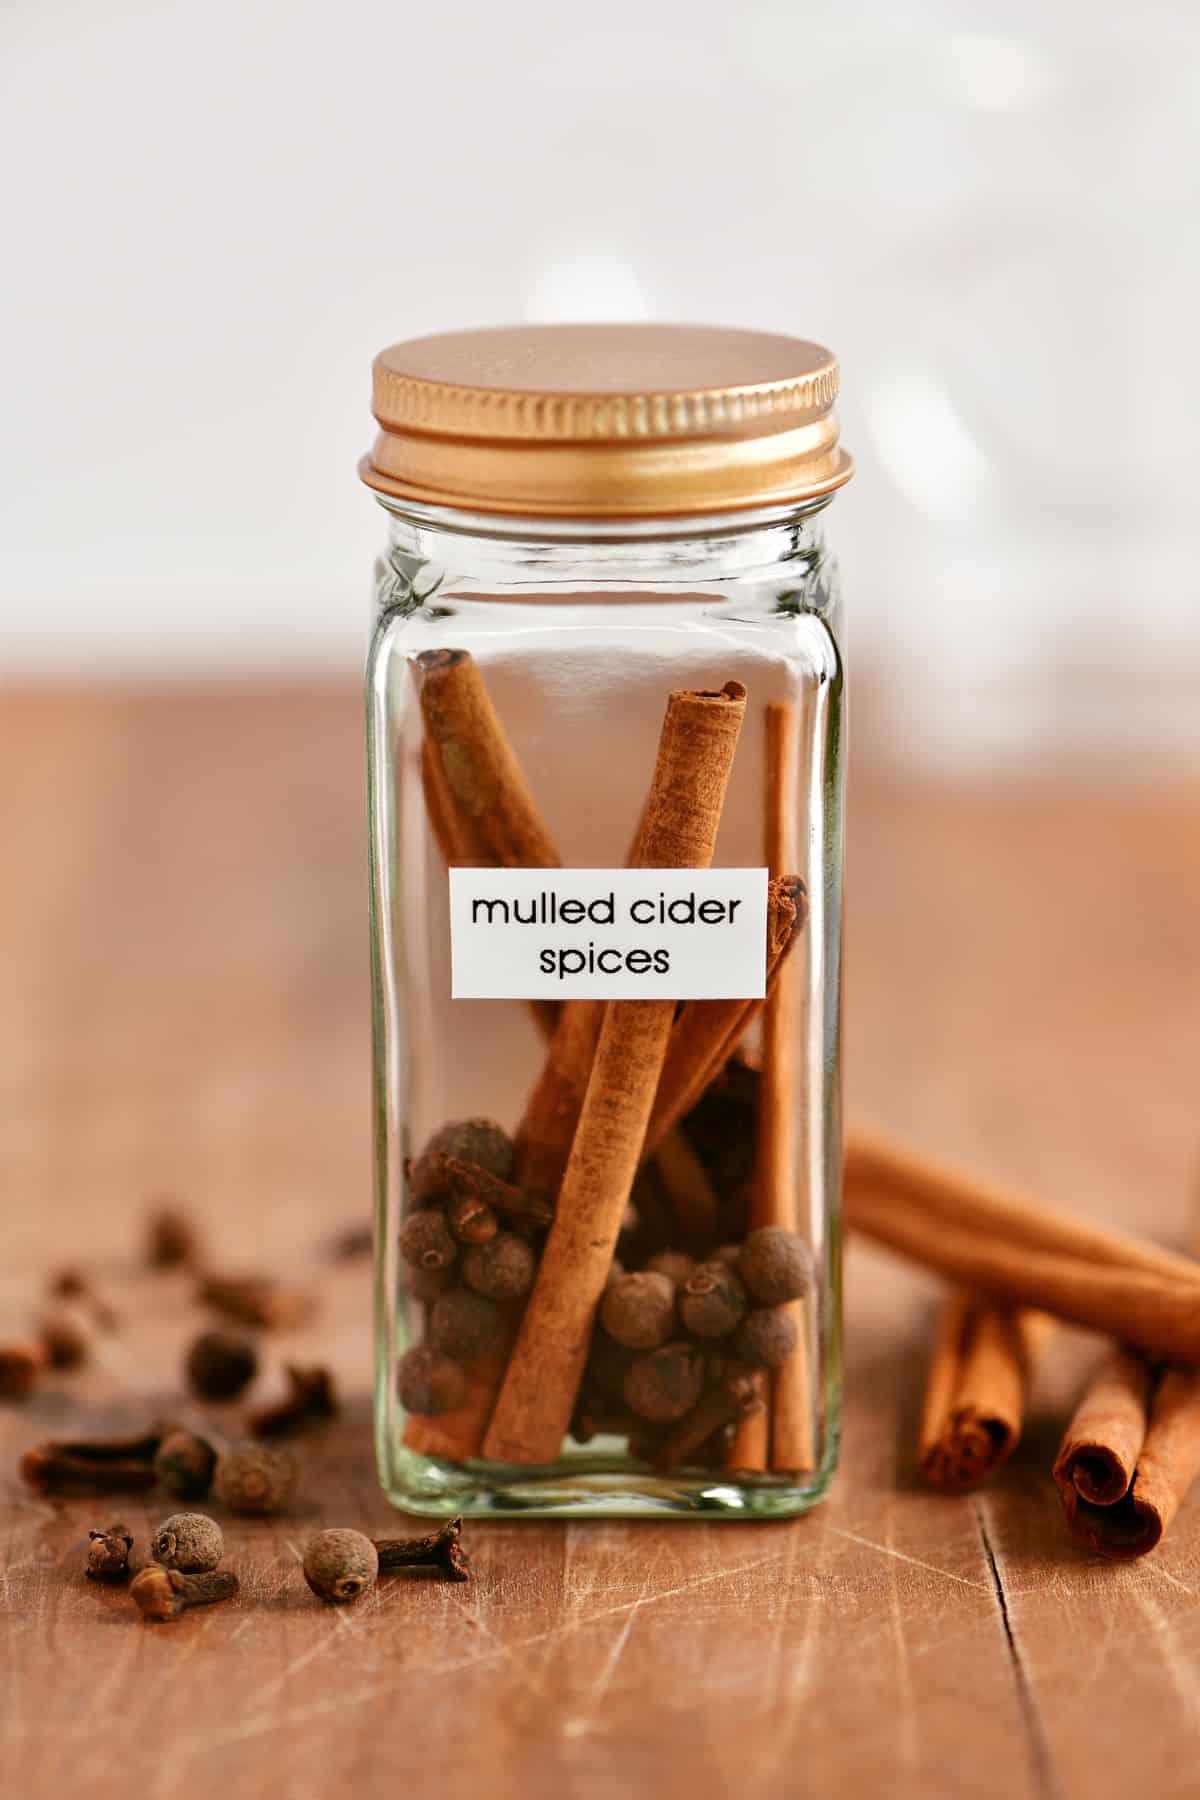 cinnamon sticks, cloves, and allspice in a glass jar